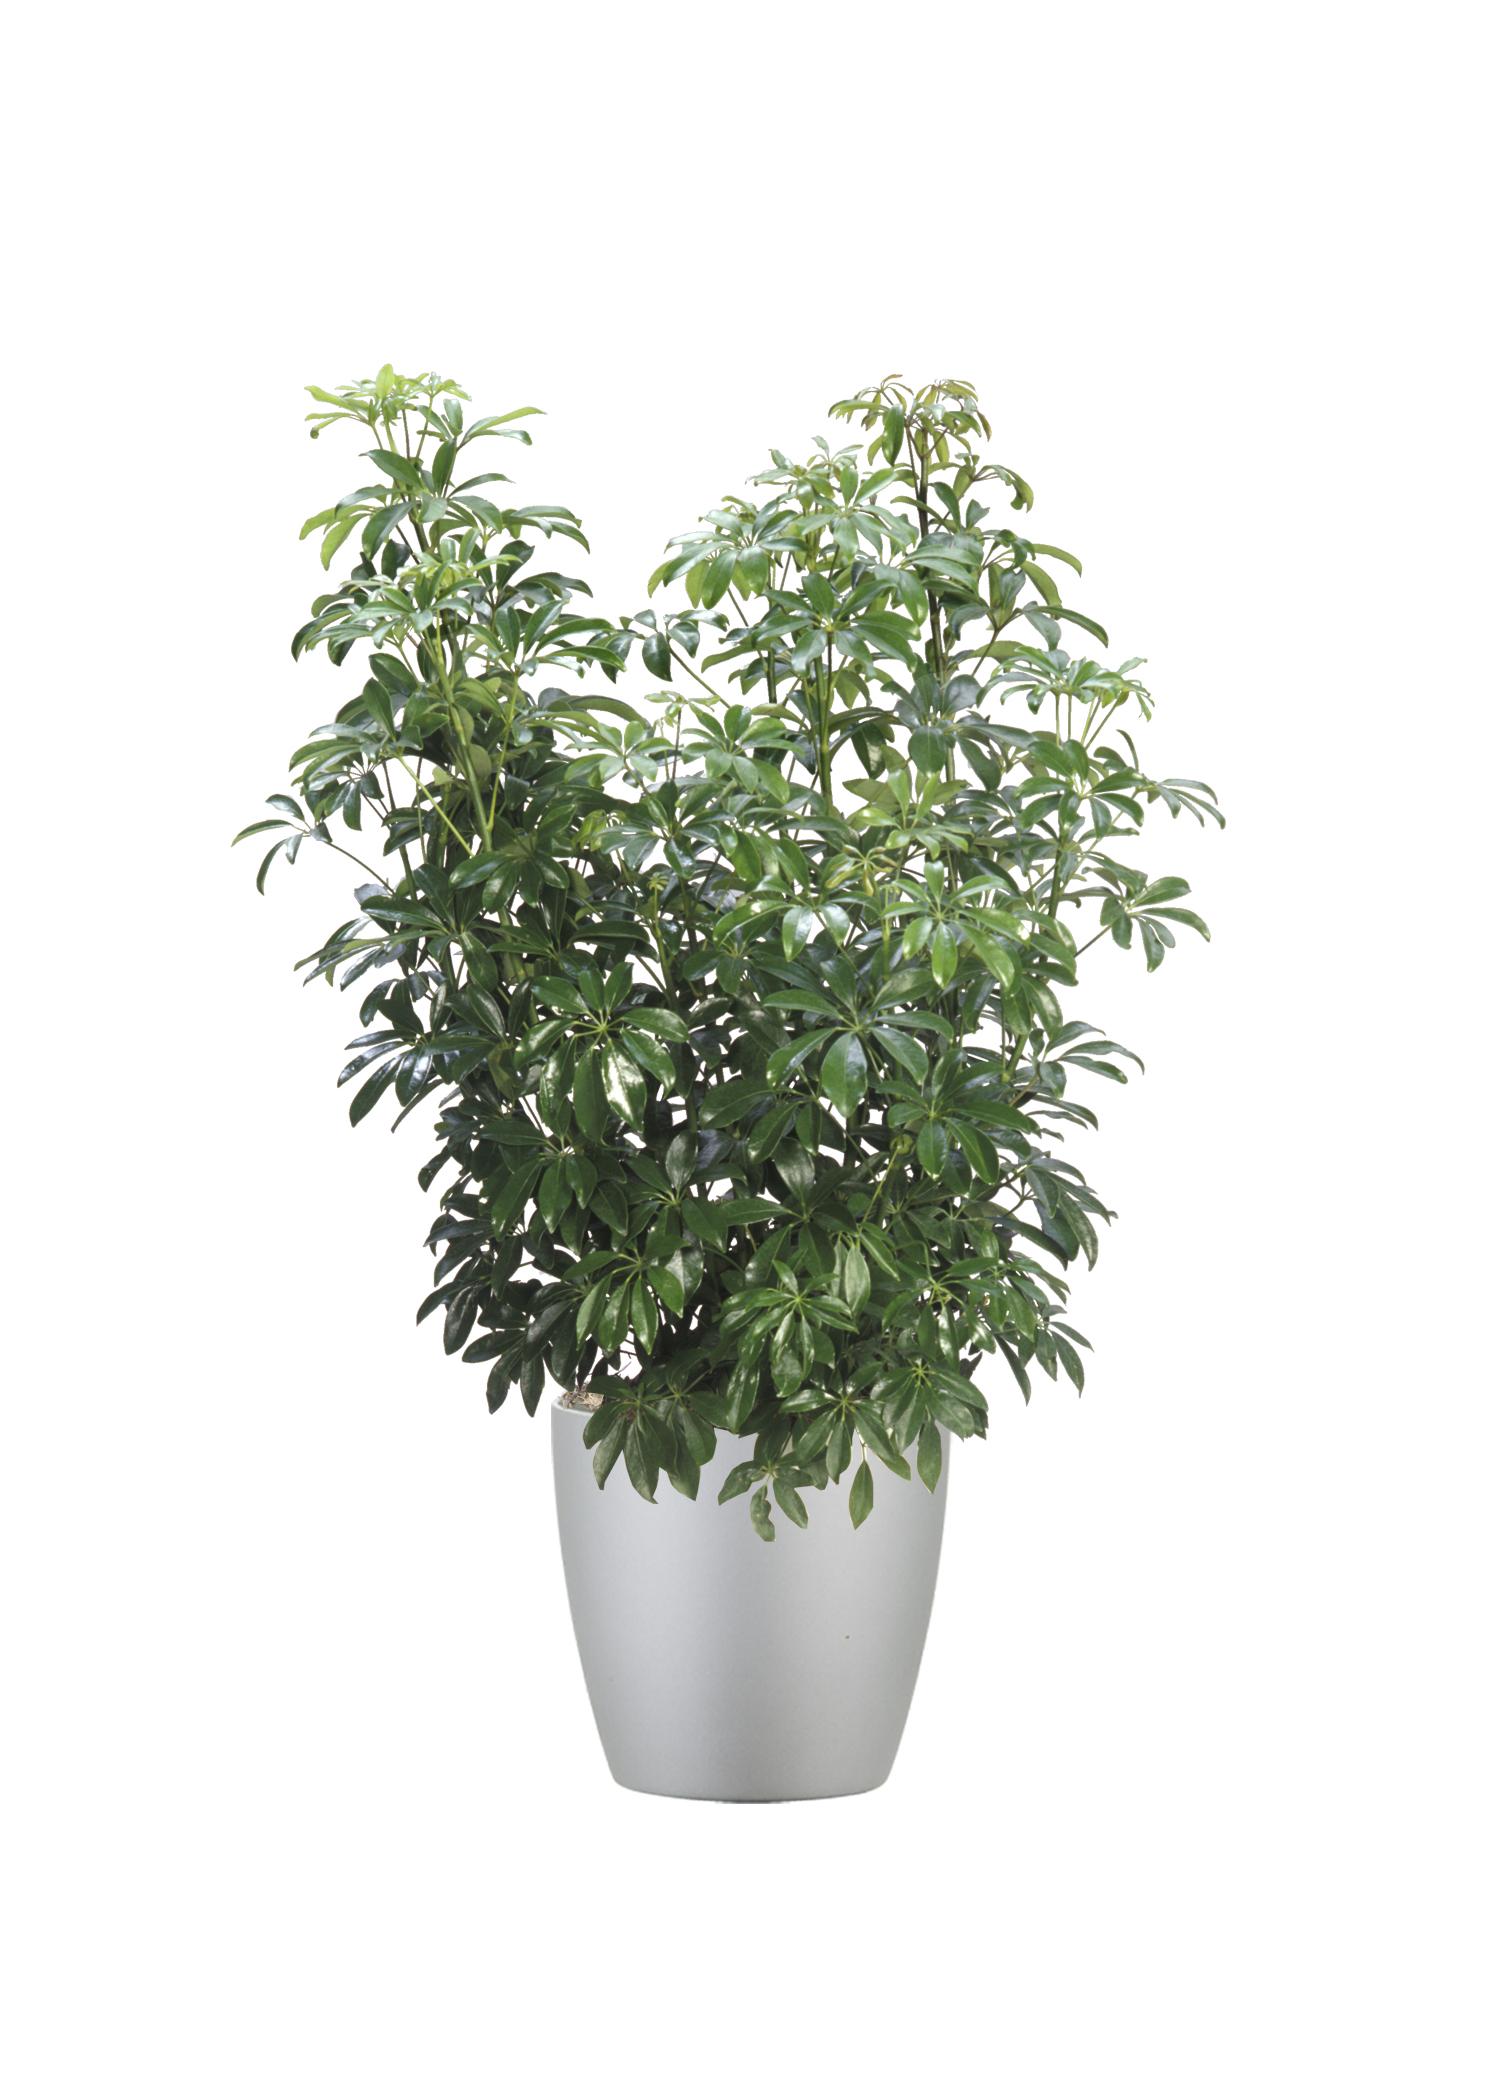 Schefflera Arboricola Green